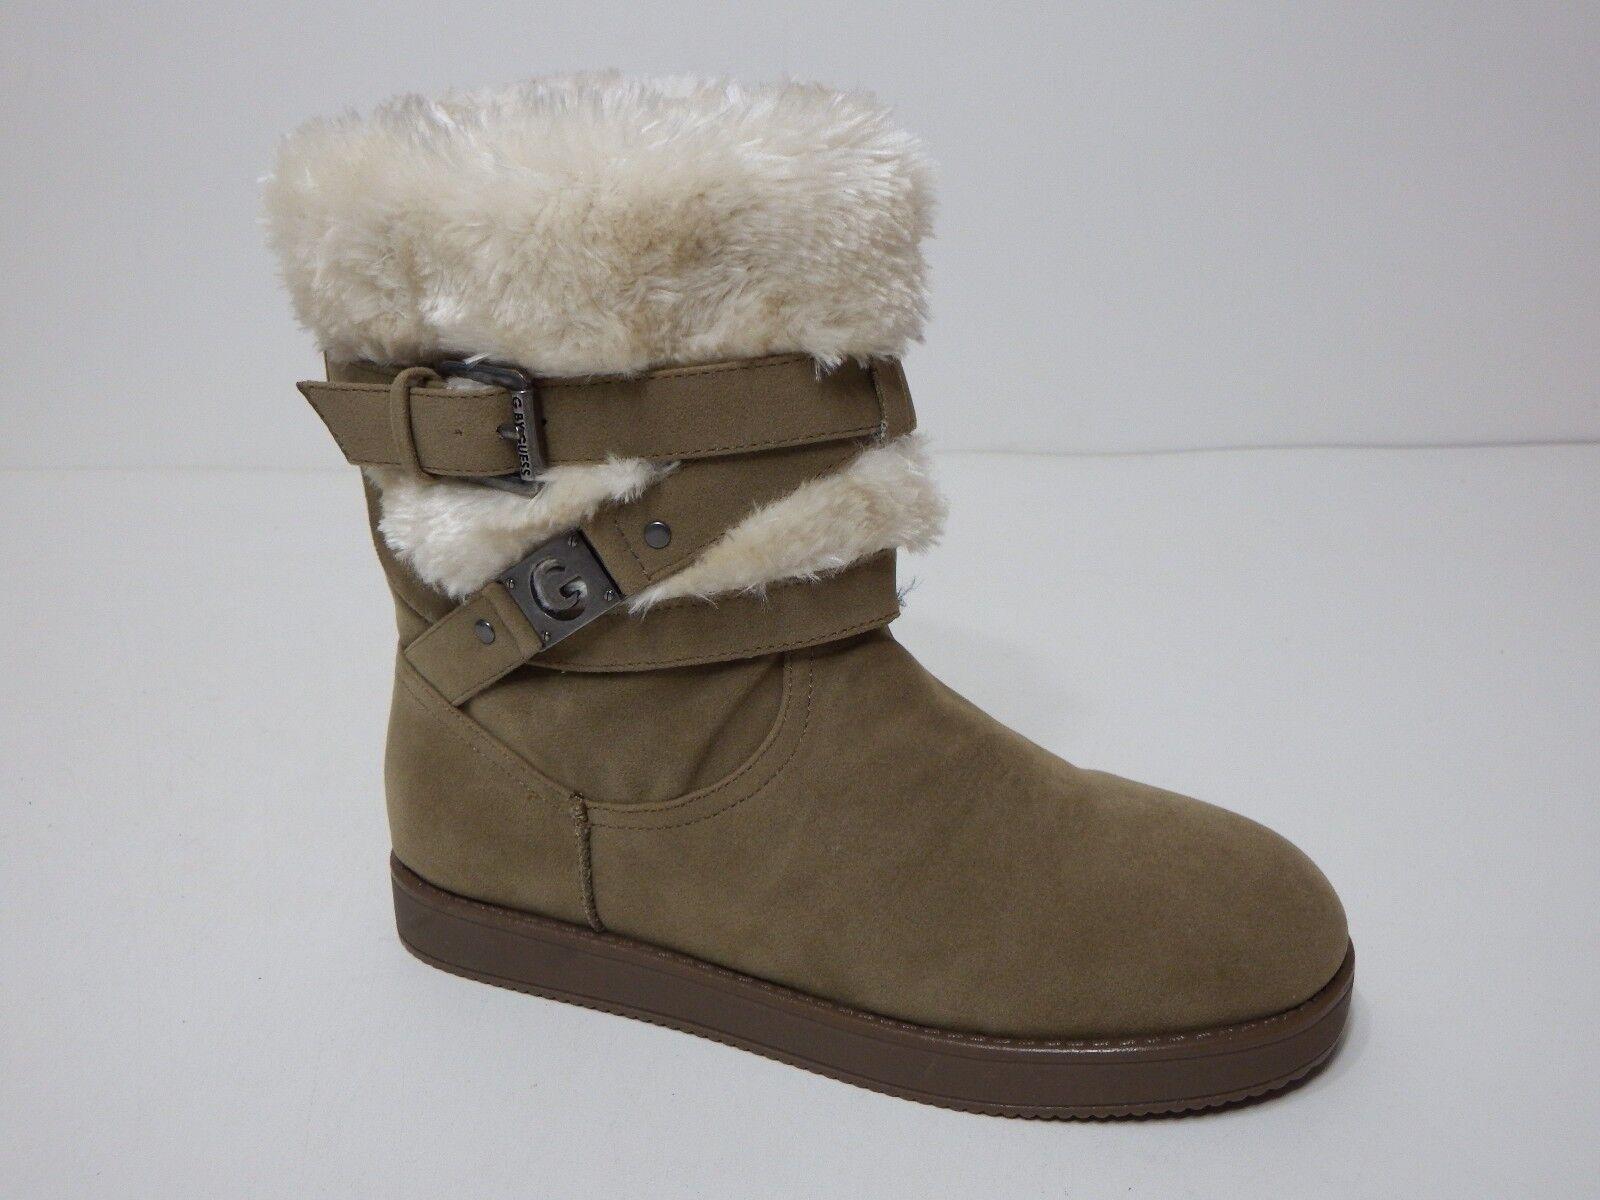 Guess Stiefel faux Damenss 5.5 M Alta Taupe Multi Fabric faux Stiefel fur buckle ankle af7a6e